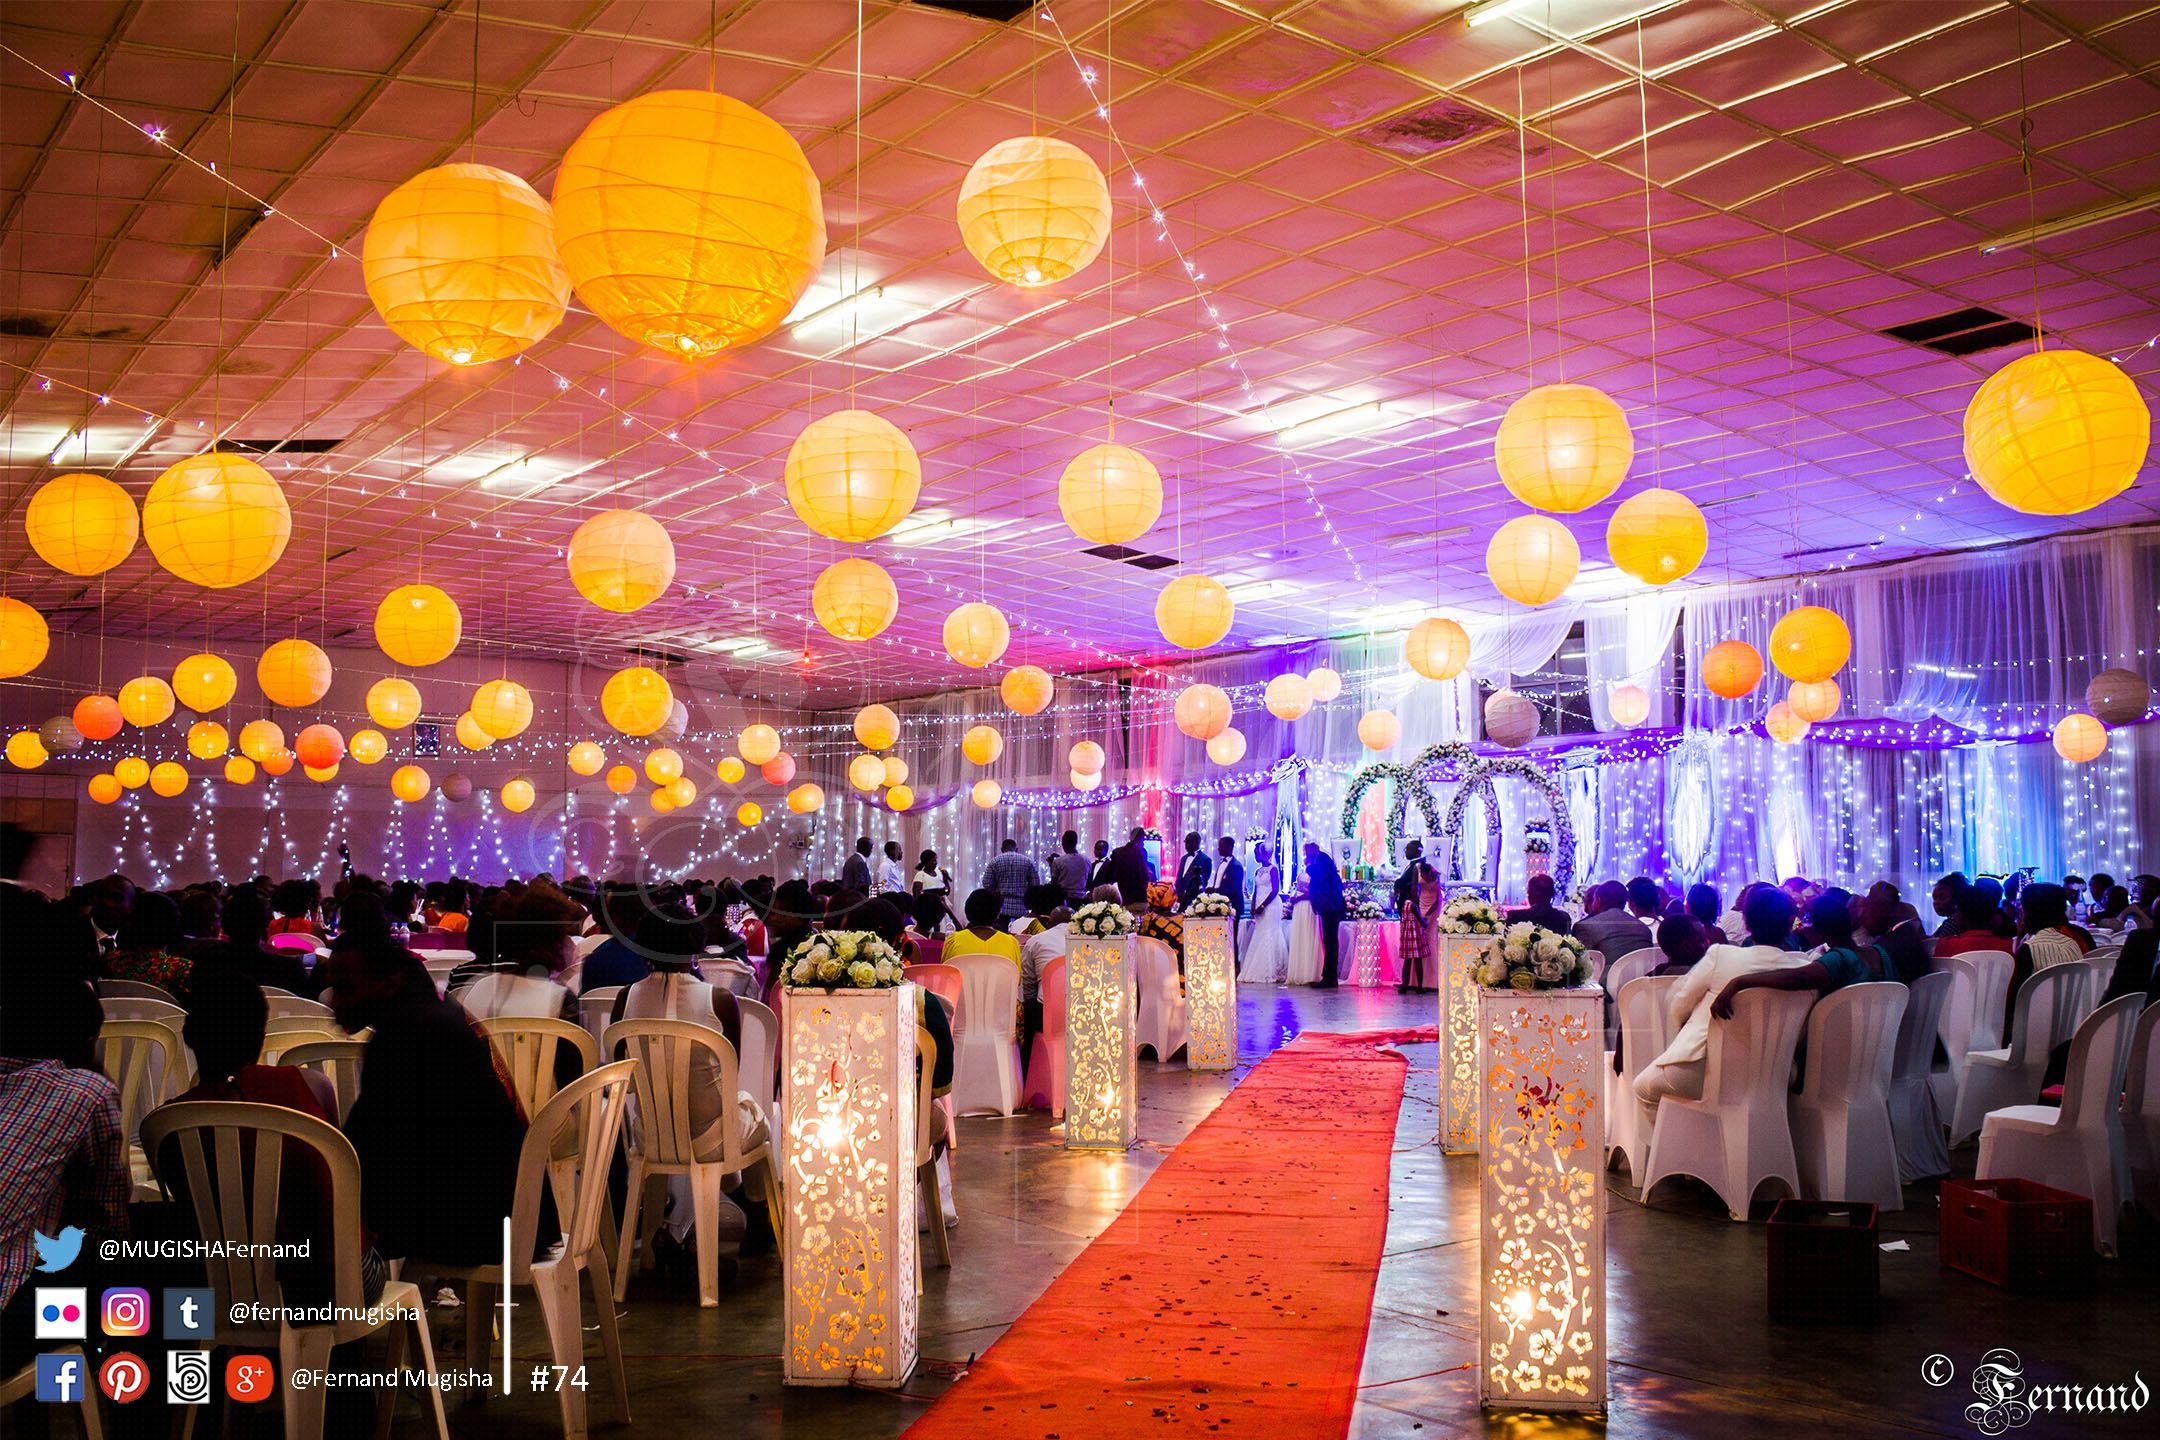 Wedding wedding full of lights indoor night lights ubukwe wedding wedding full of lights indoor night lights ubukwe kigali rwanda fernandphotography 0847 pm 45 sec at f63 iso 200 18 mm dimensions junglespirit Gallery